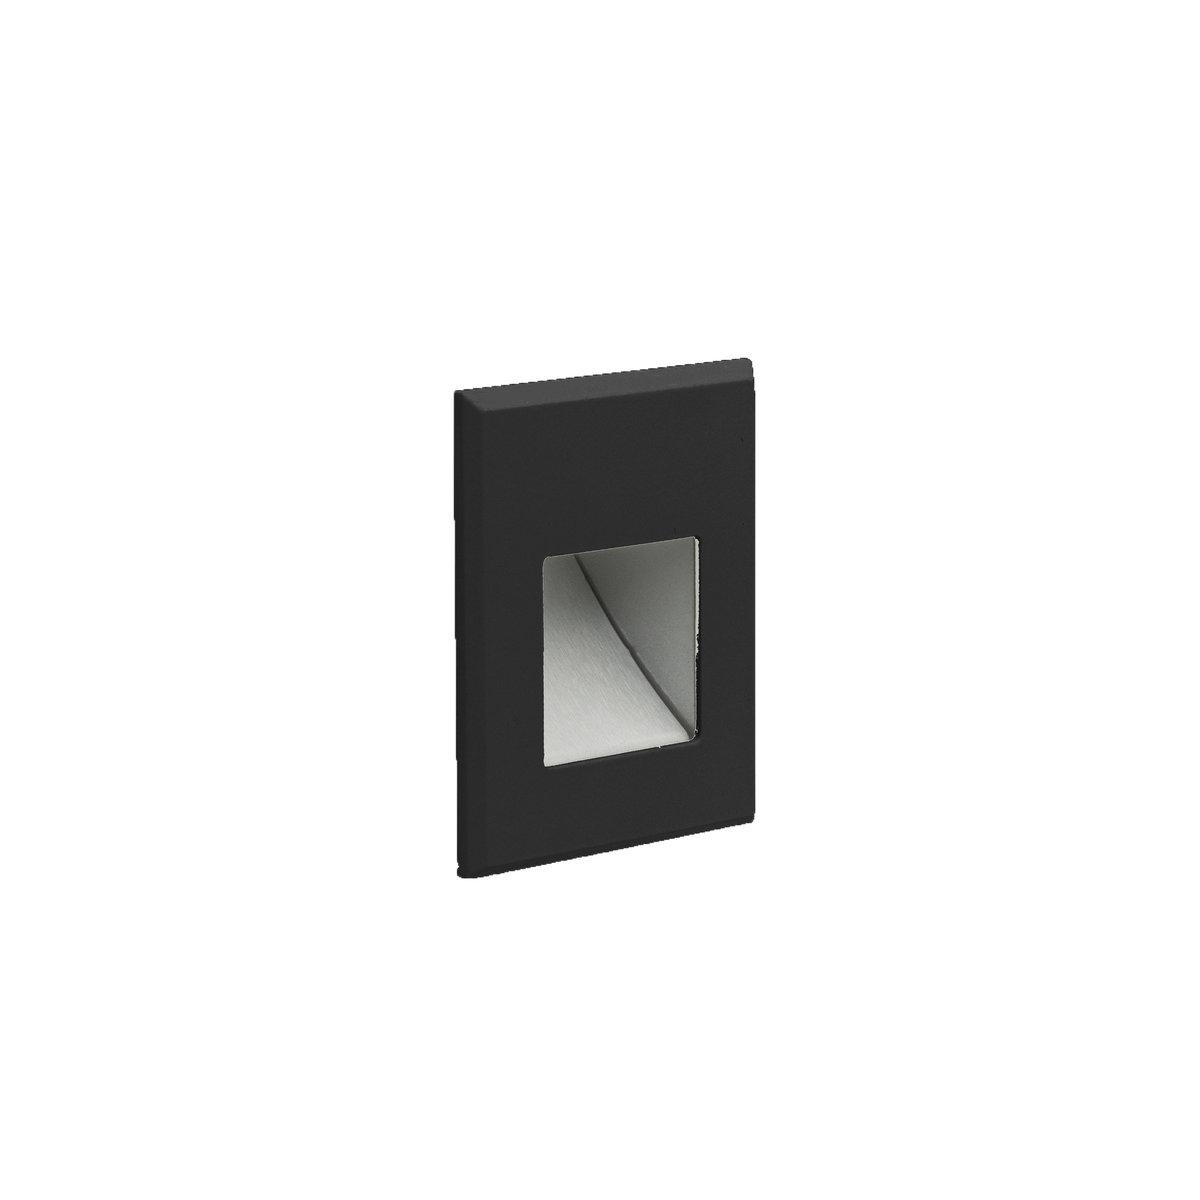 Cazalla Miniature Steplight main image